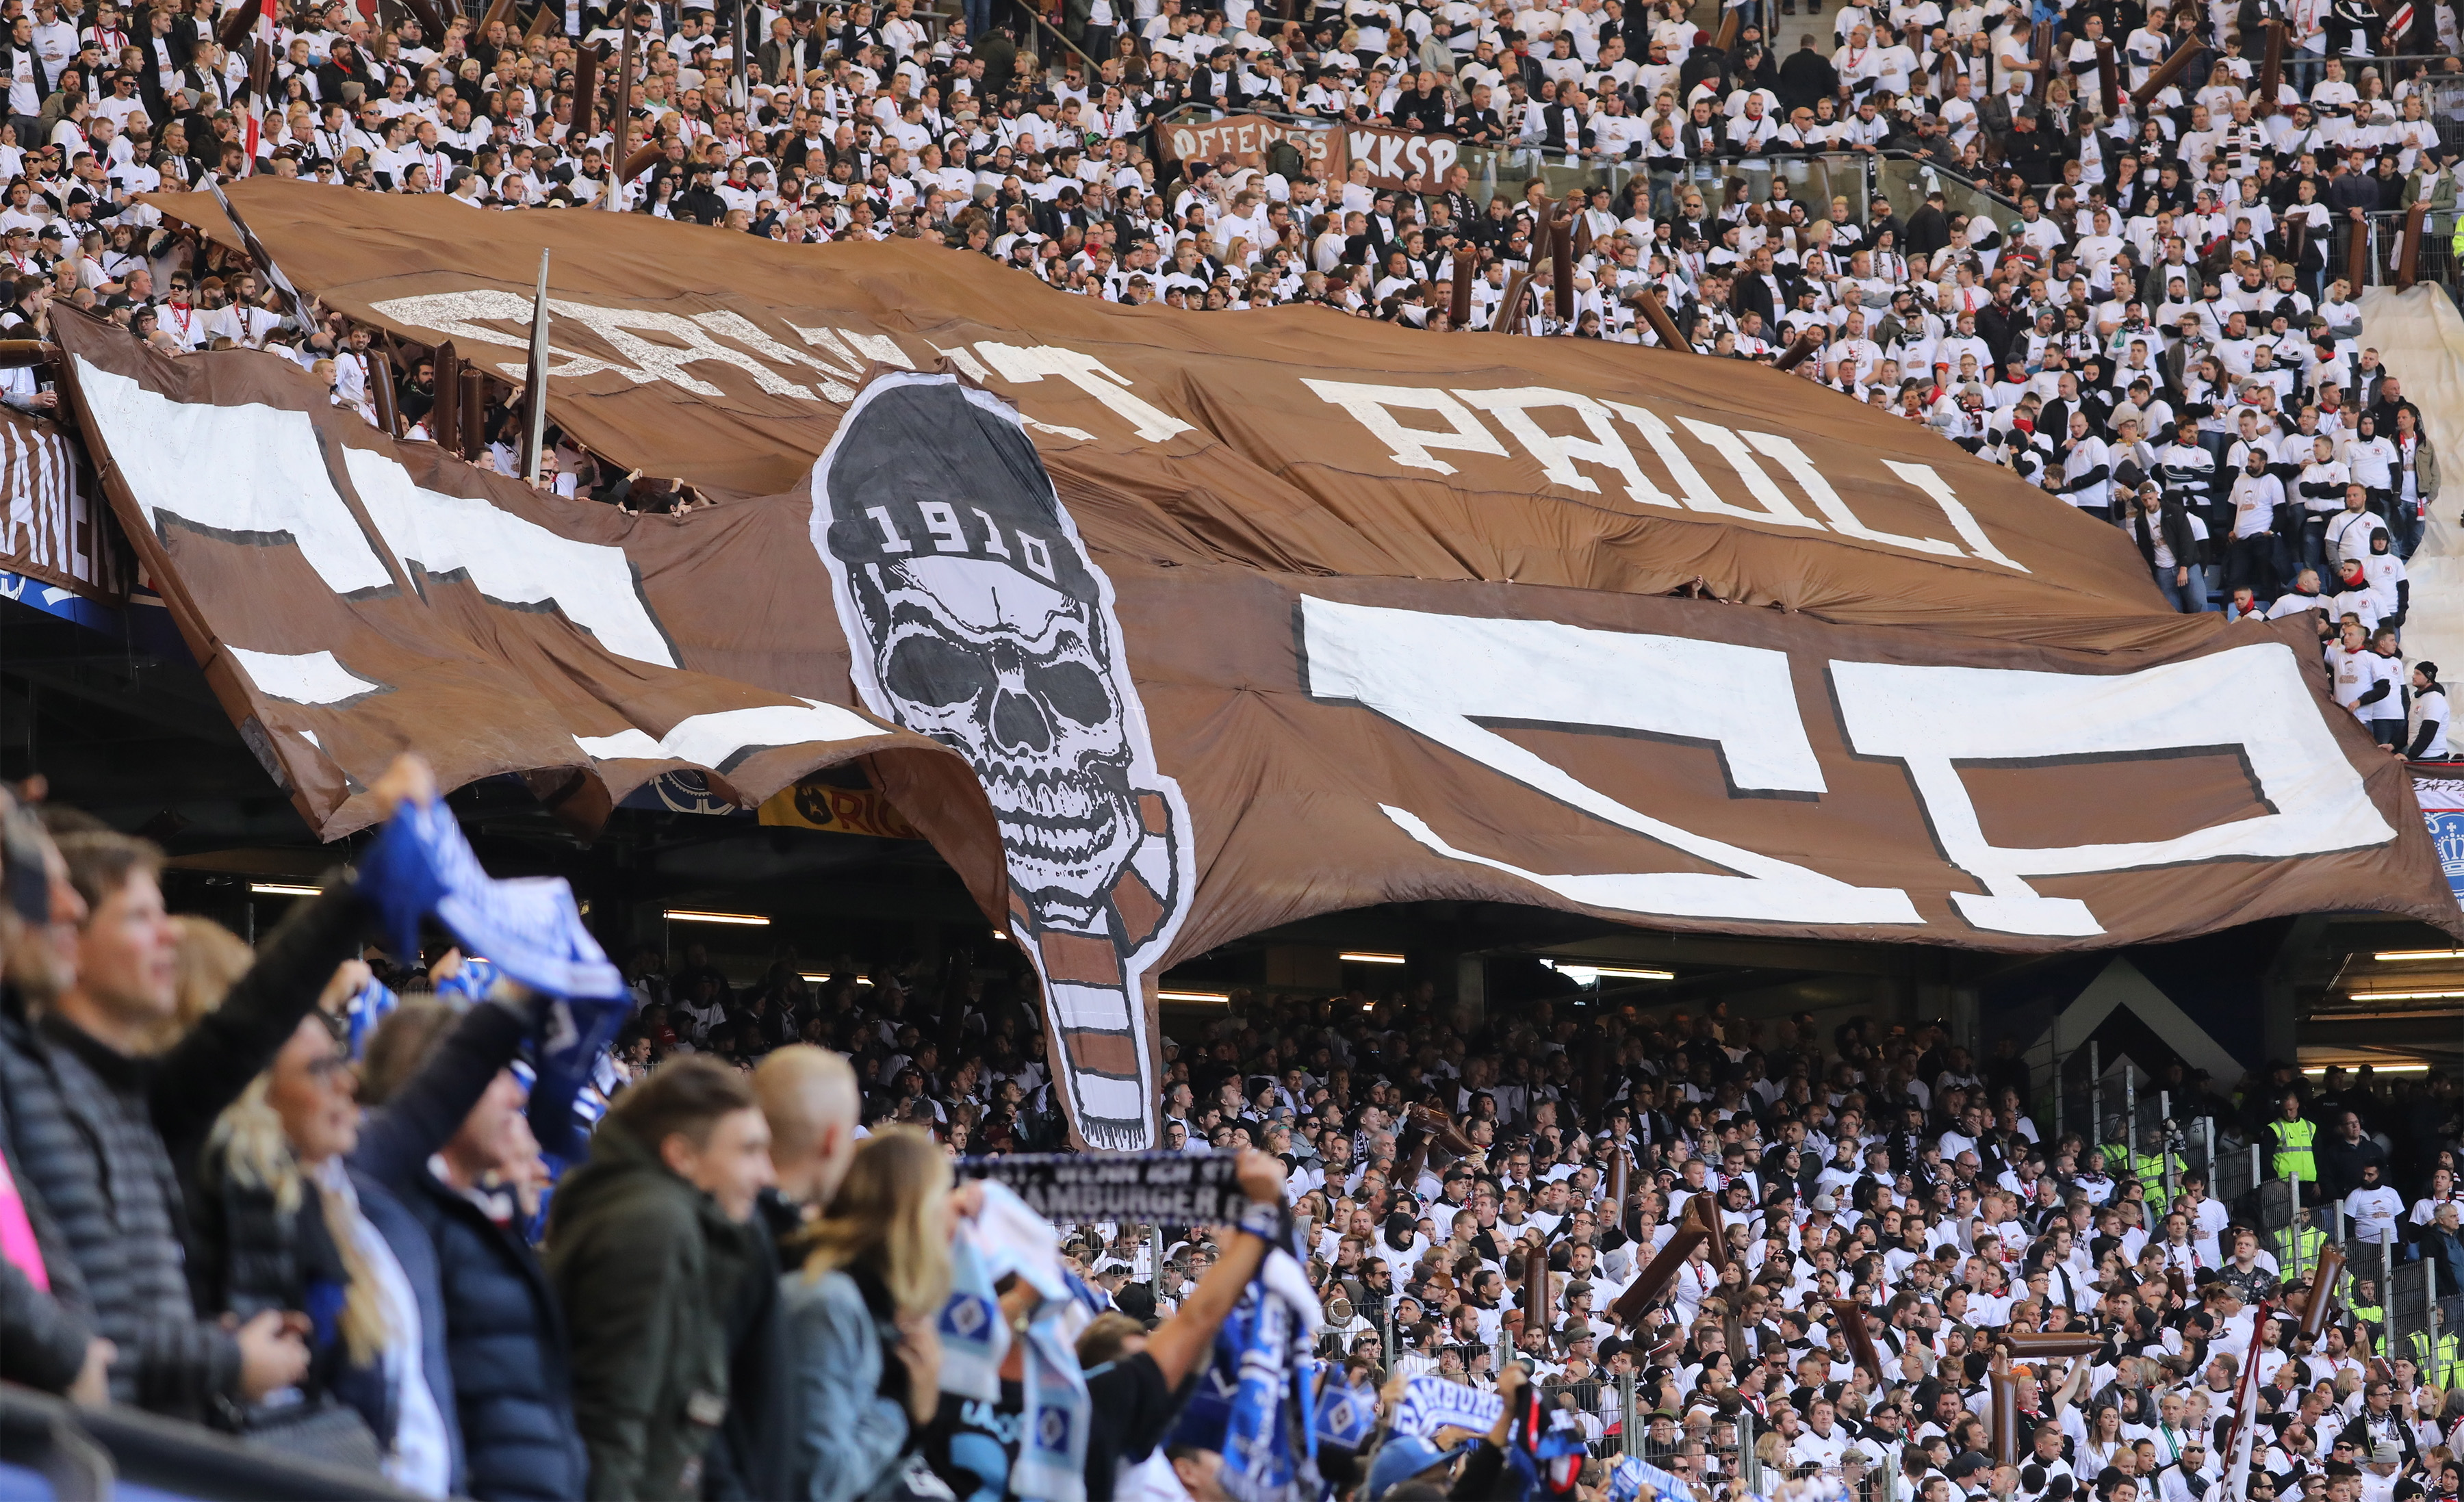 St. Pauli dispensa jogador turco que apoiou tropas na ofensiva contra os curdos